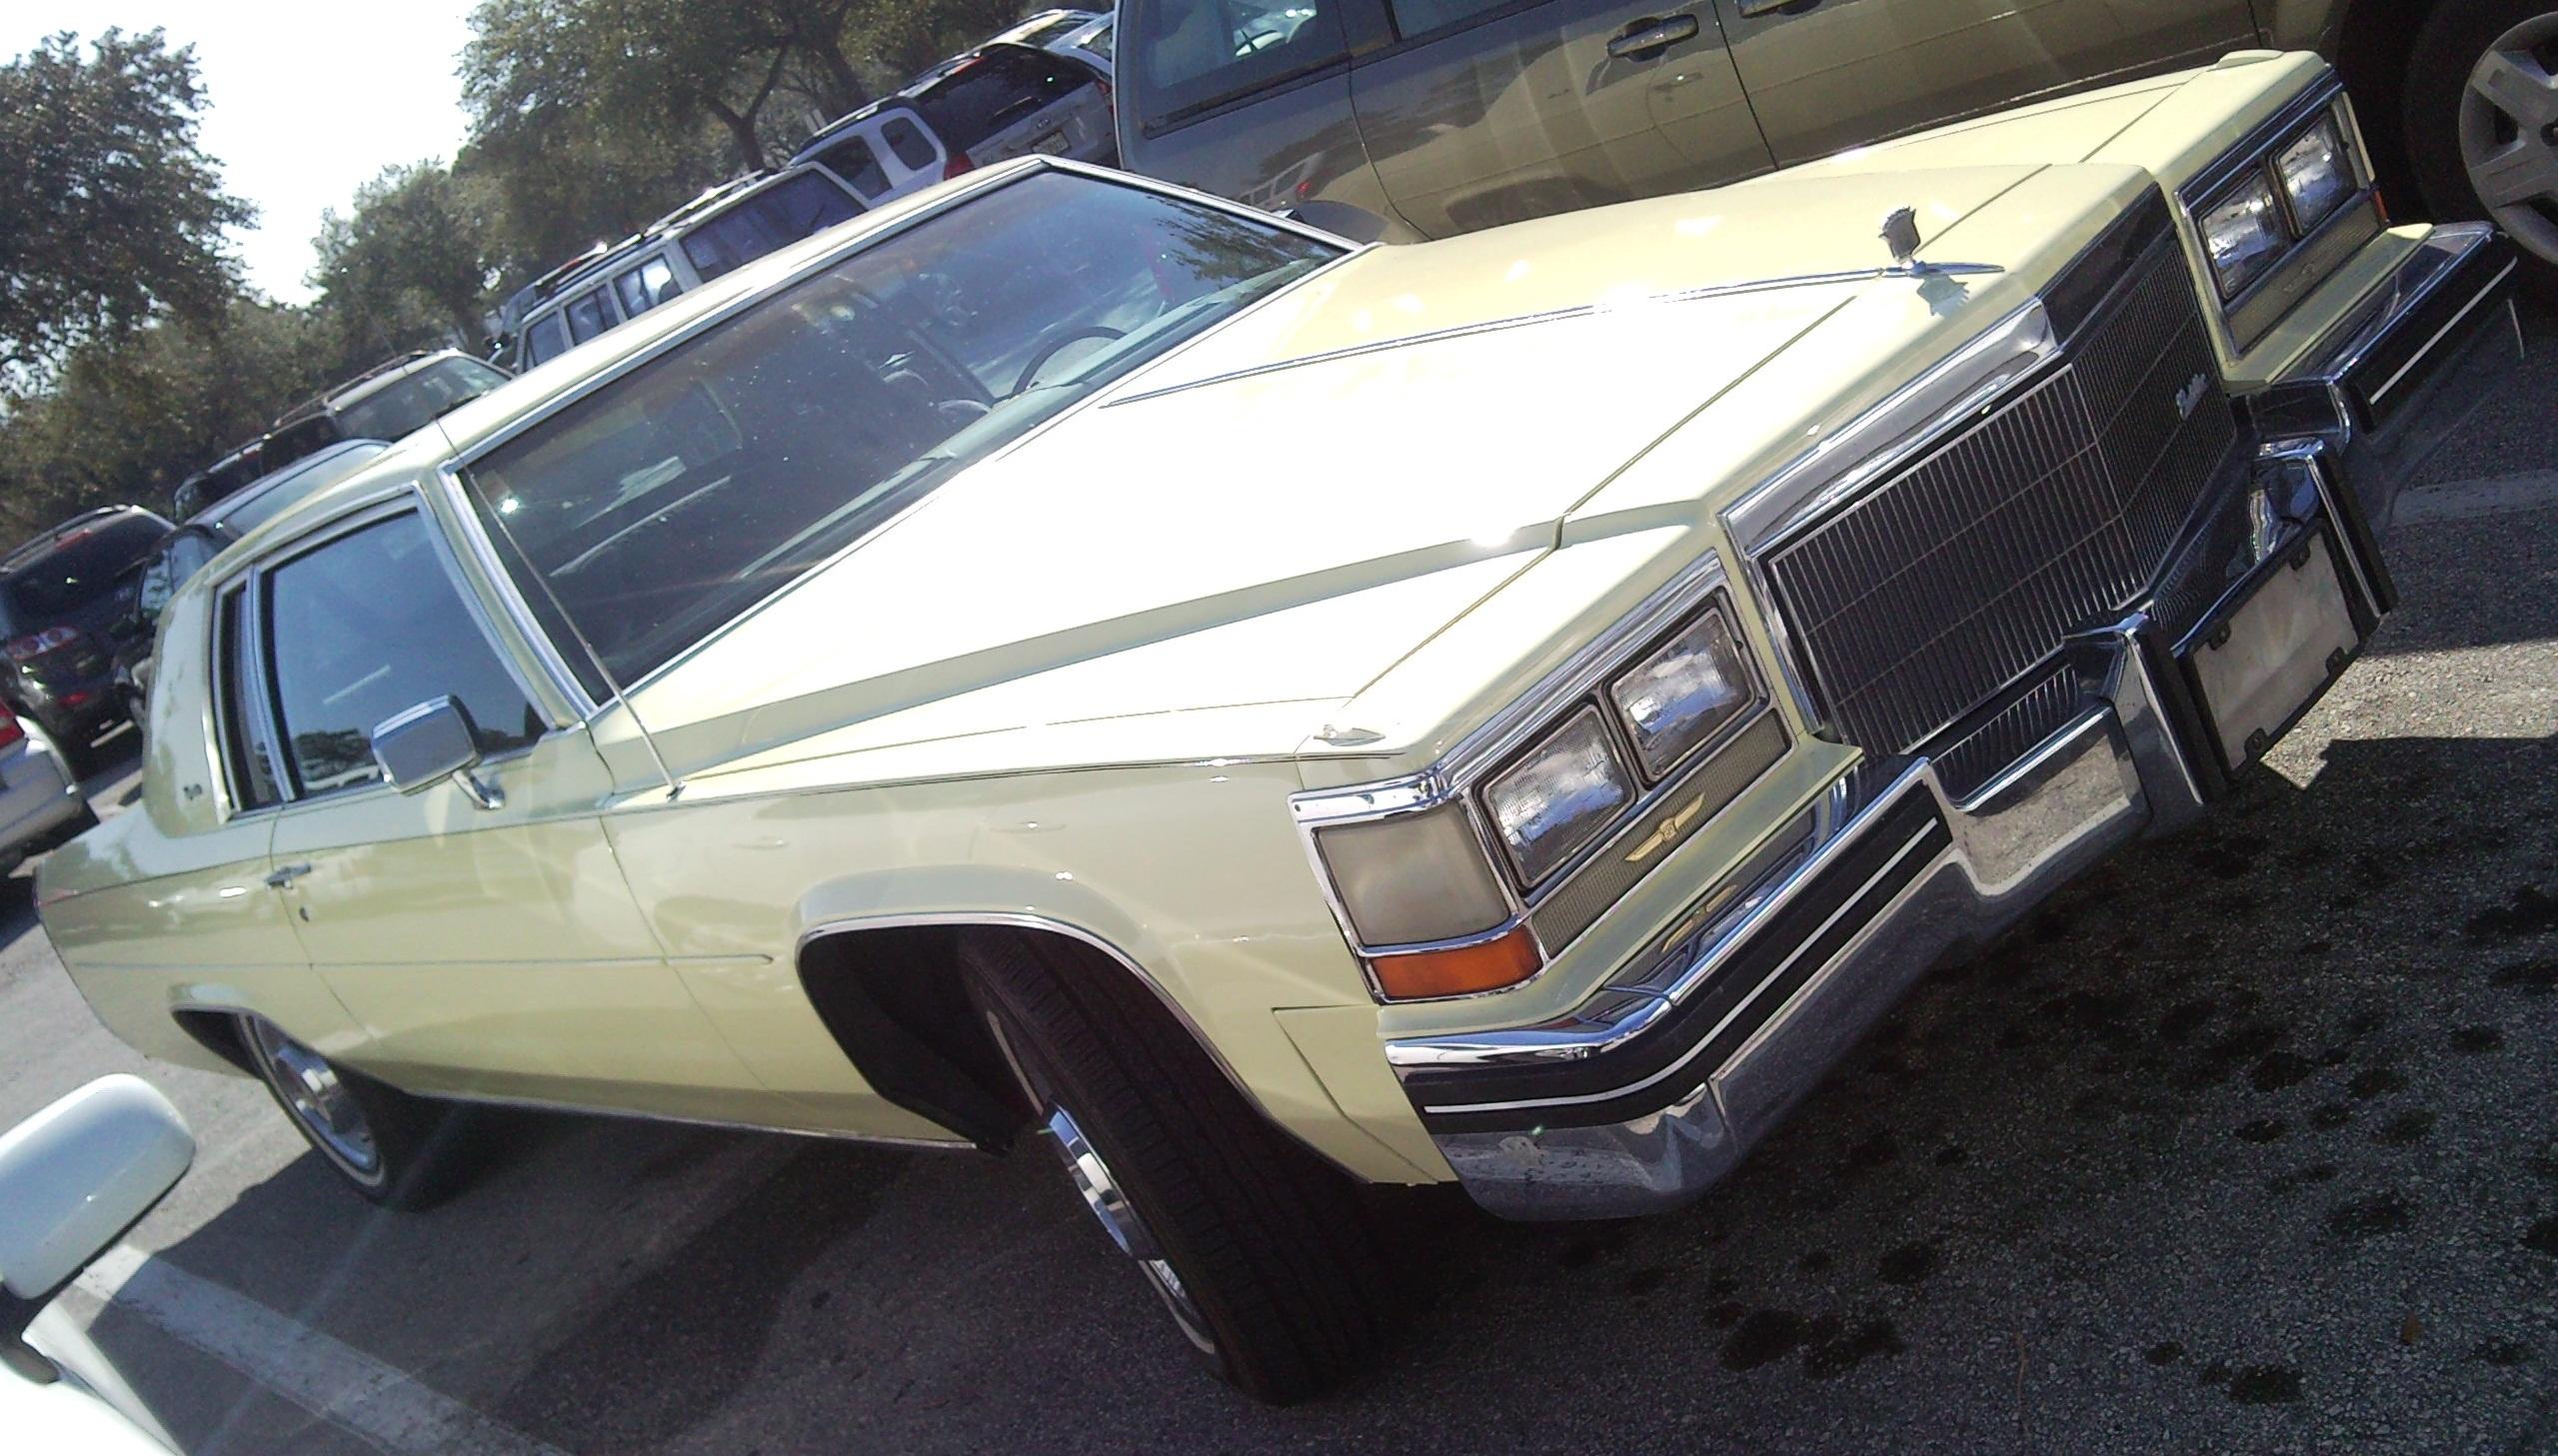 File:'83 Cadillac Coupe De Ville.jpg - Wikimedia Commons